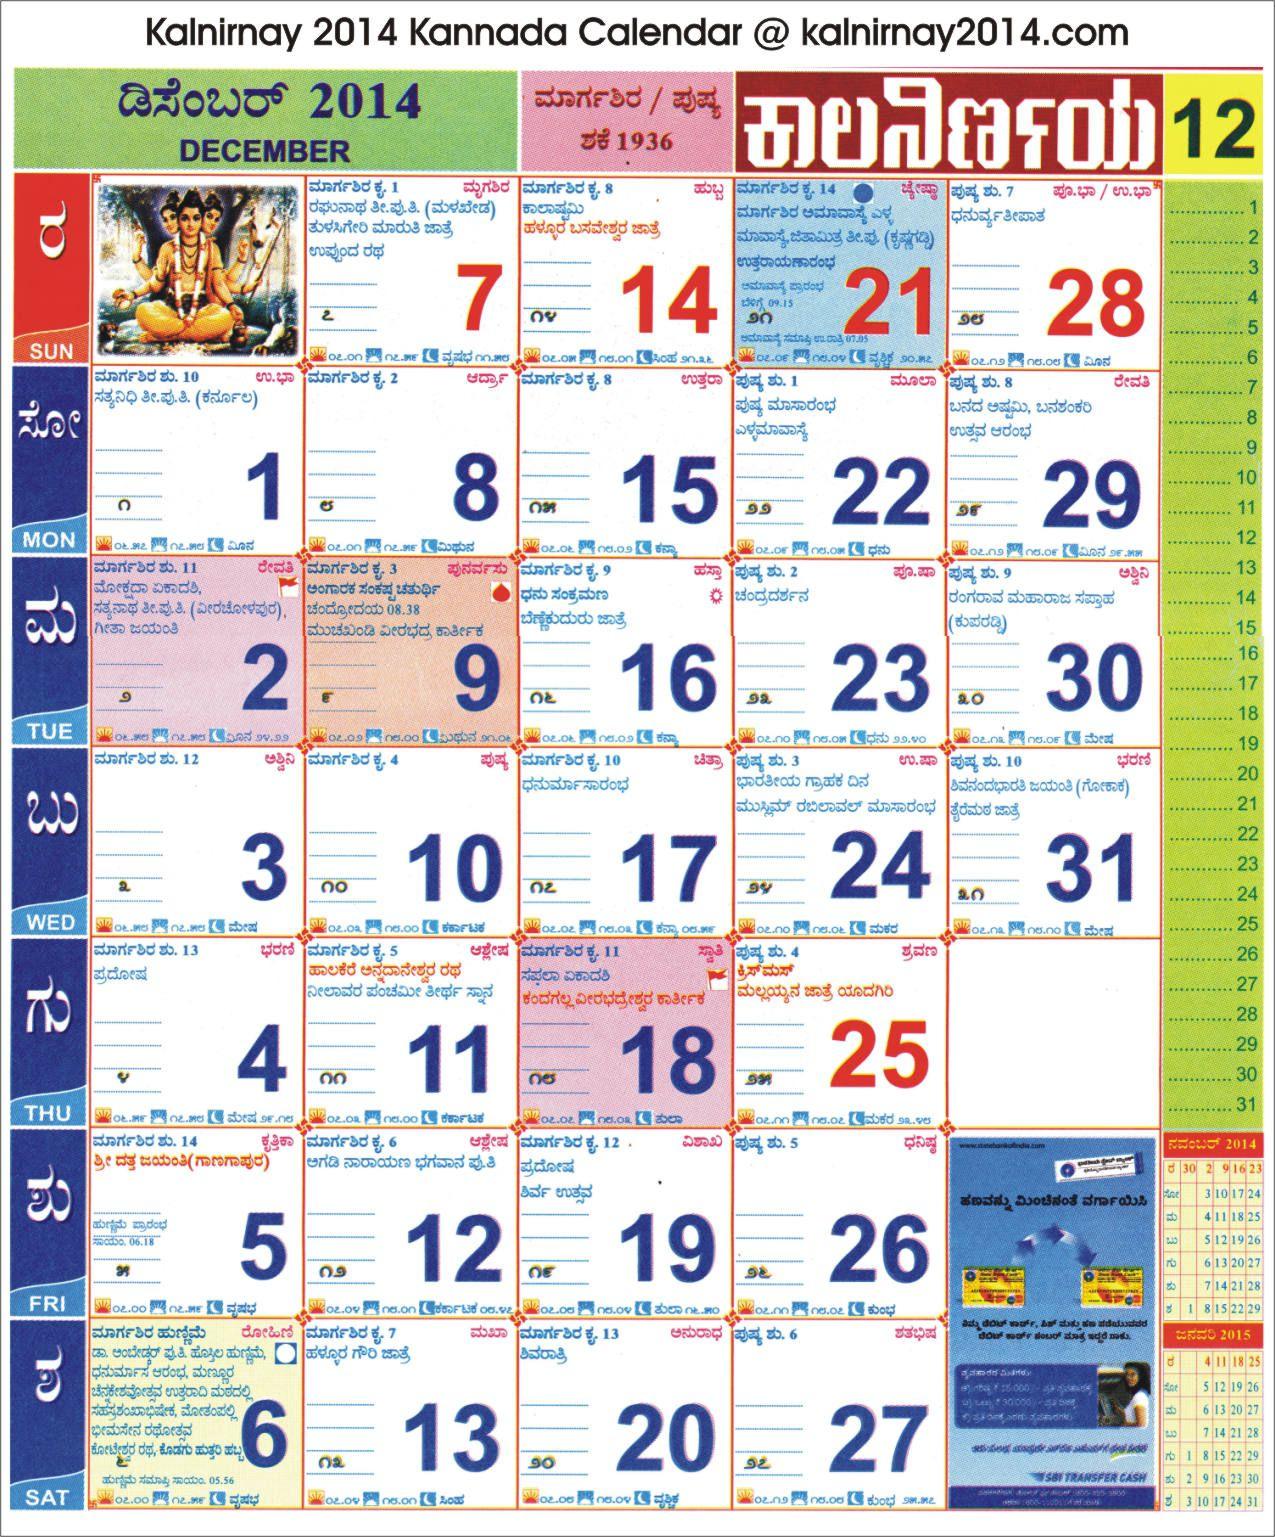 December 2014 Kannada Kalnirnay Calendar | February for 1986 Calendar In Kannada Panchangam